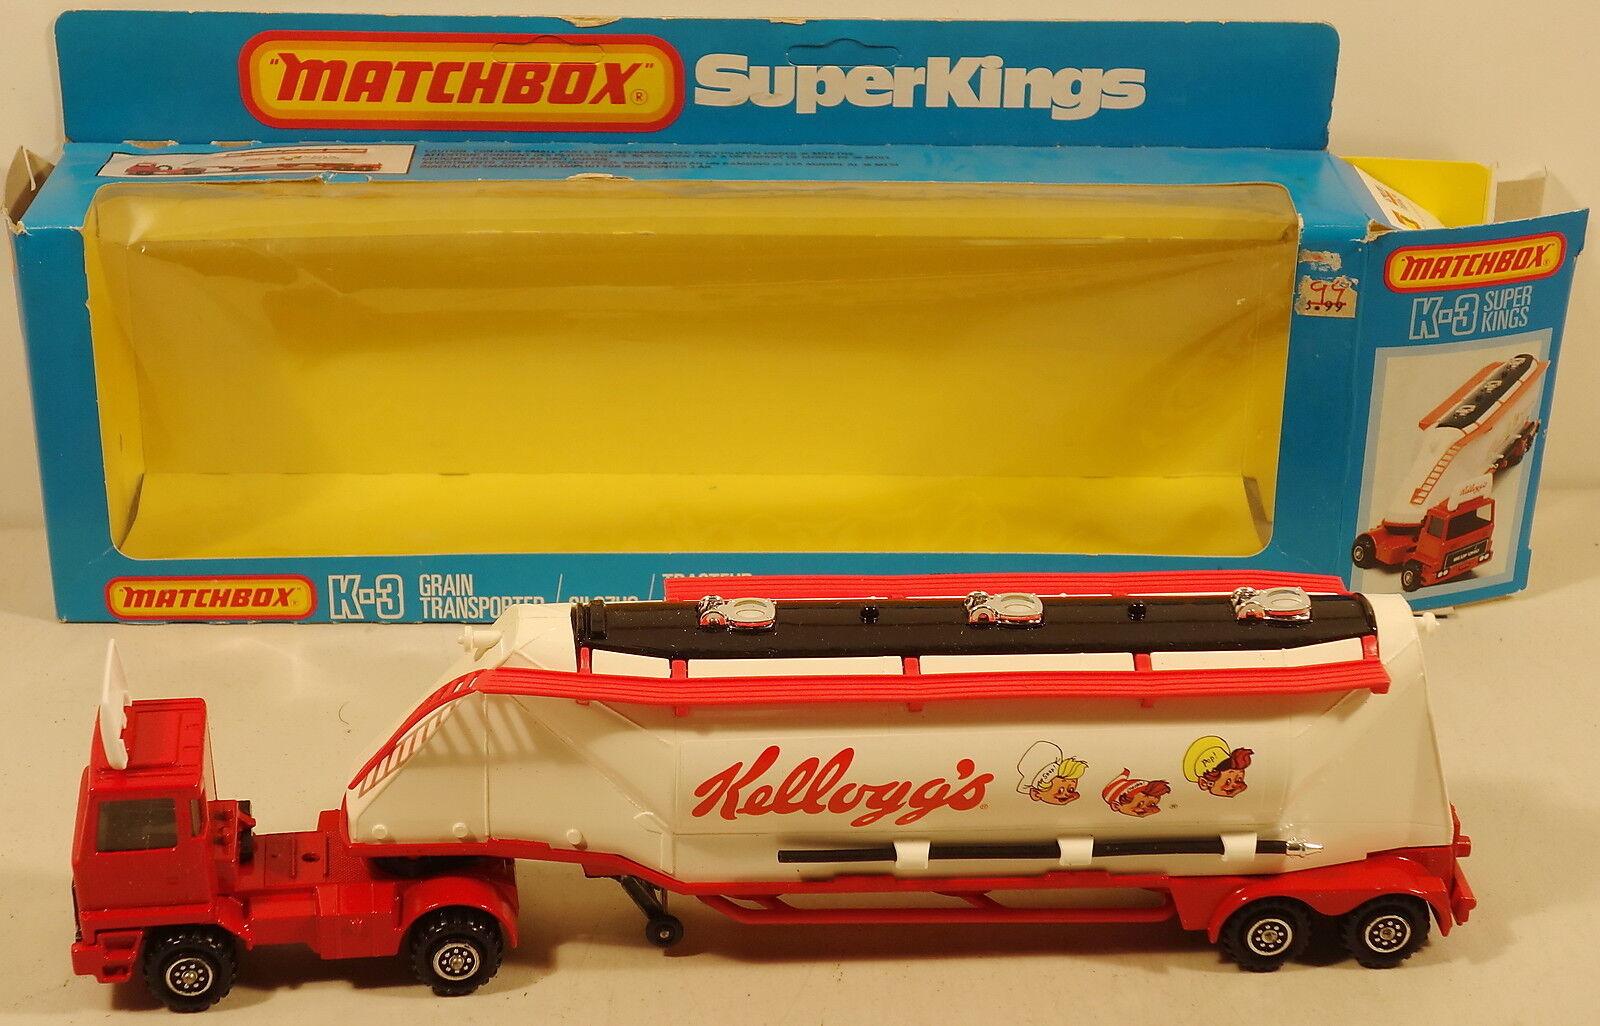 DTE Lesney Matchbox súperkings SK-3 Lrg  Kellogg's  Etiqueta grano Transportador Nuevo En Caja Original